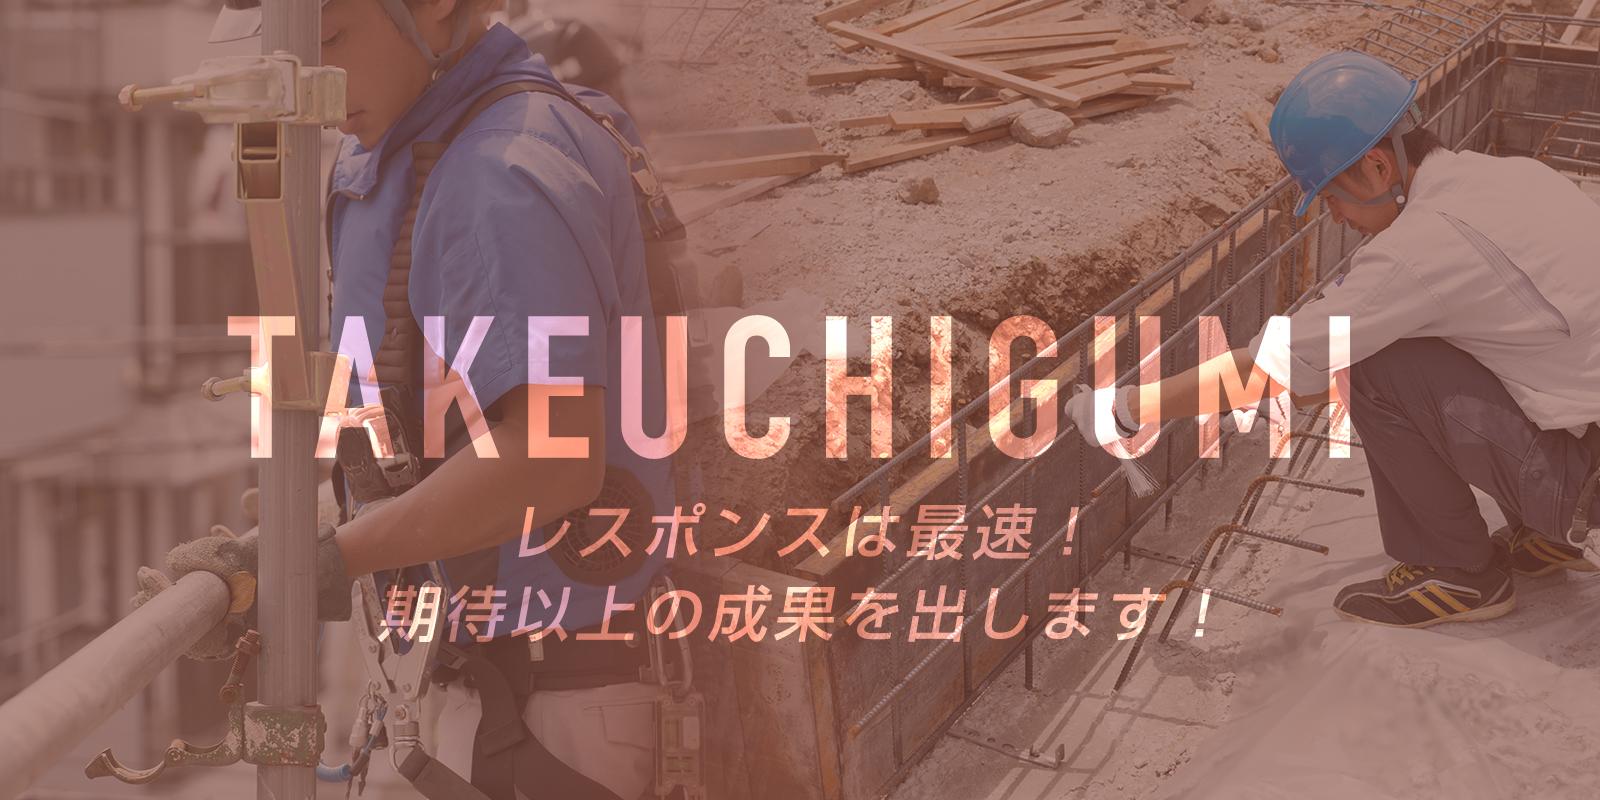 TAKEUCHIGUMI レスポンスは最速!期待以上の成果を出します!